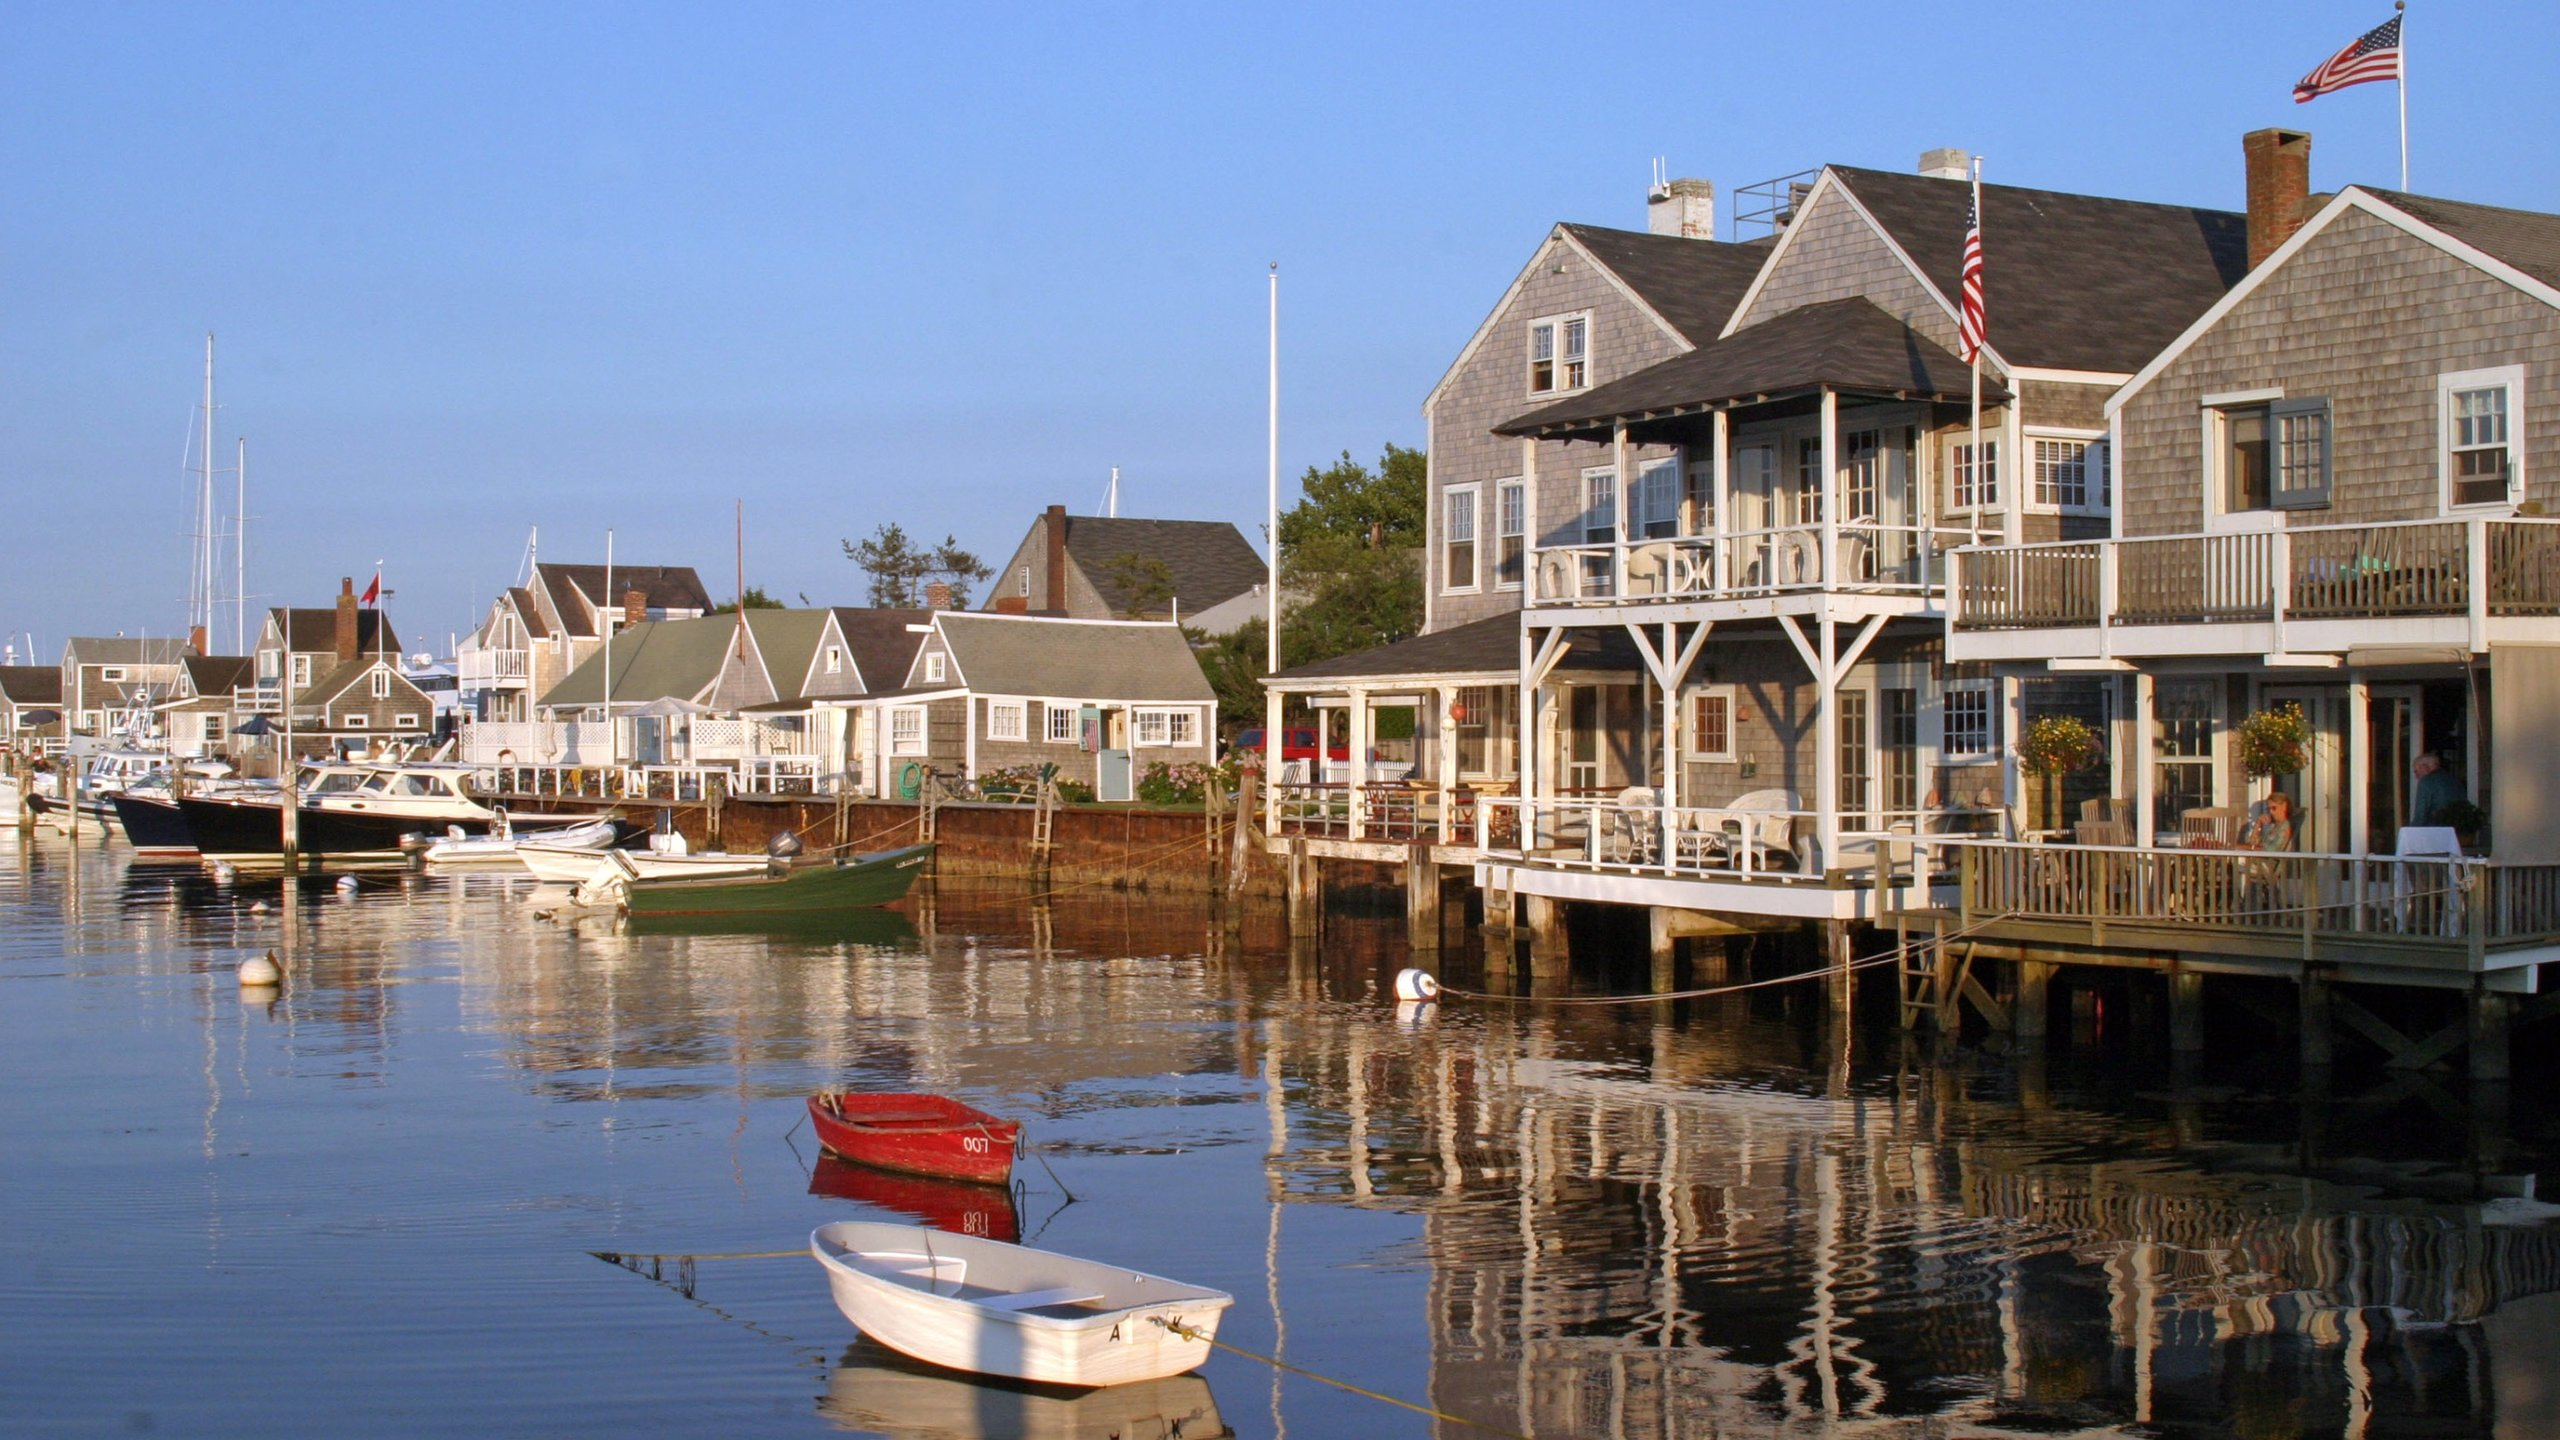 Nantucket, Massachusetts, United States of America